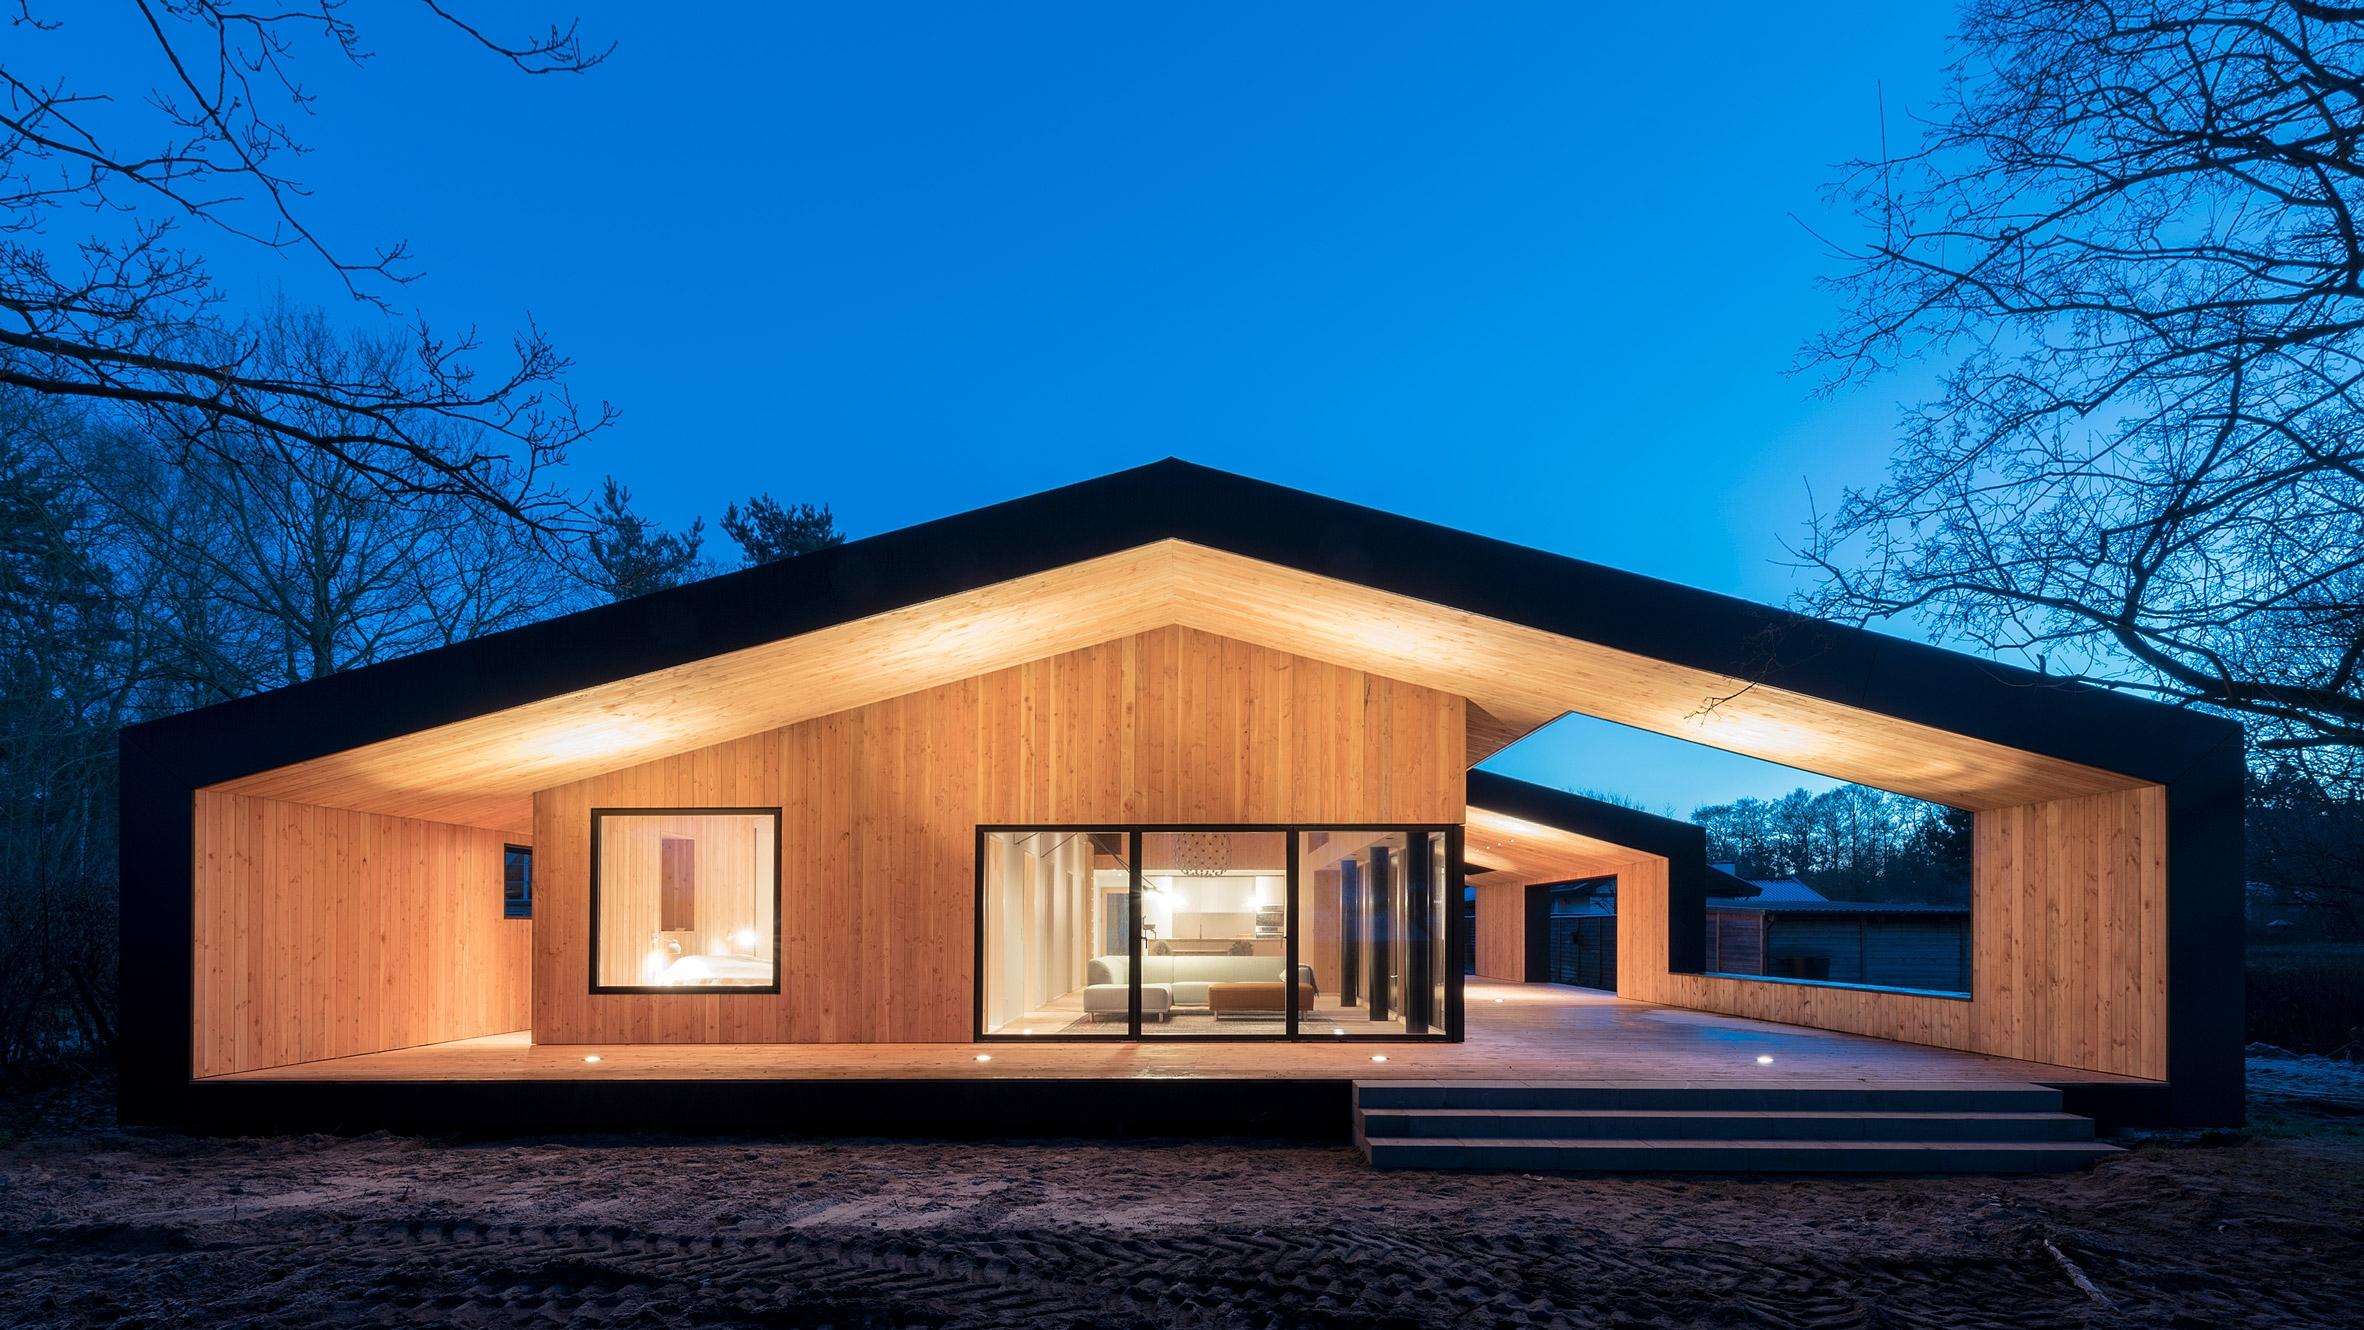 Oversized roof shelters terrace - elloarchitecture | ello